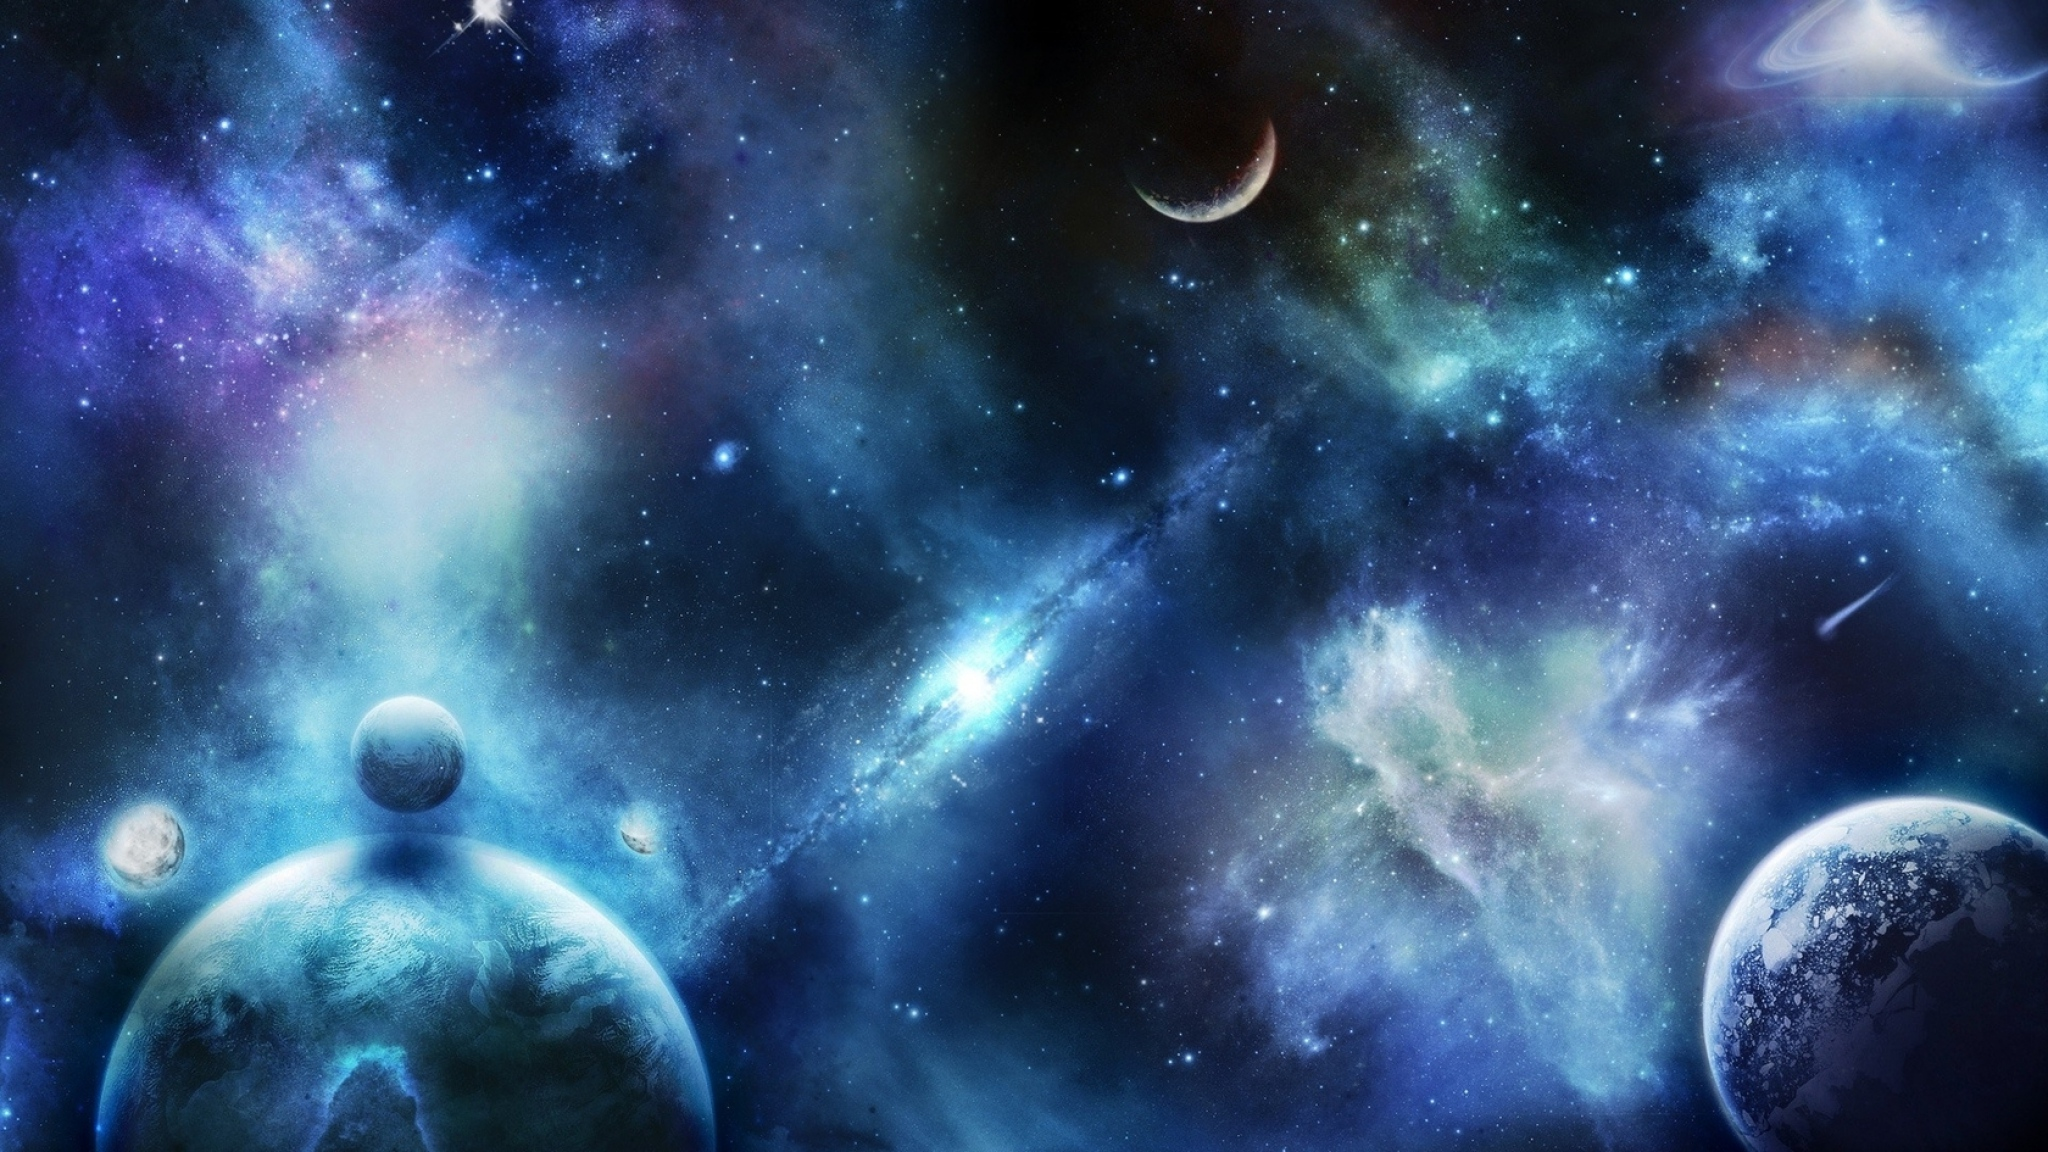 2048x1152 Wallpaper planets stars space universe spots blurring 2048x1152